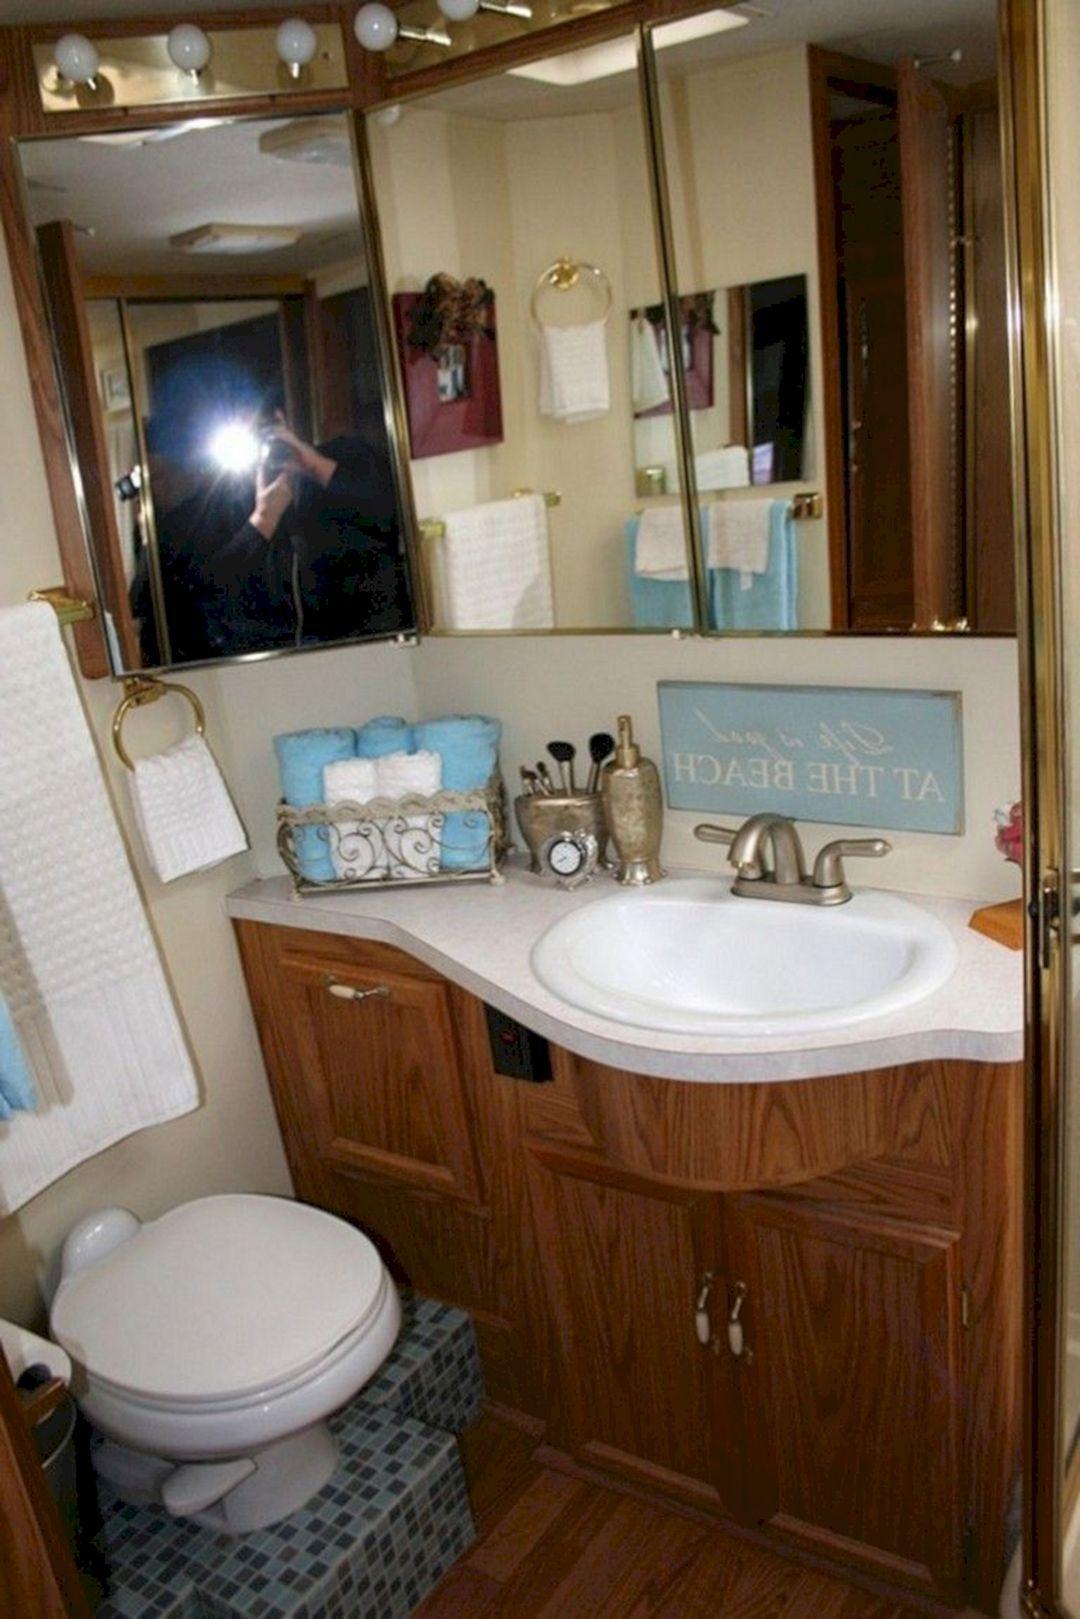 15 Incredible Rv Bathroom Remodel Hack Ideas You Must Need To Try Rvbathroomdesign Rvbathr Bathroom Collections Bathrooms Remodel Diy Remodel [ 1619 x 1080 Pixel ]